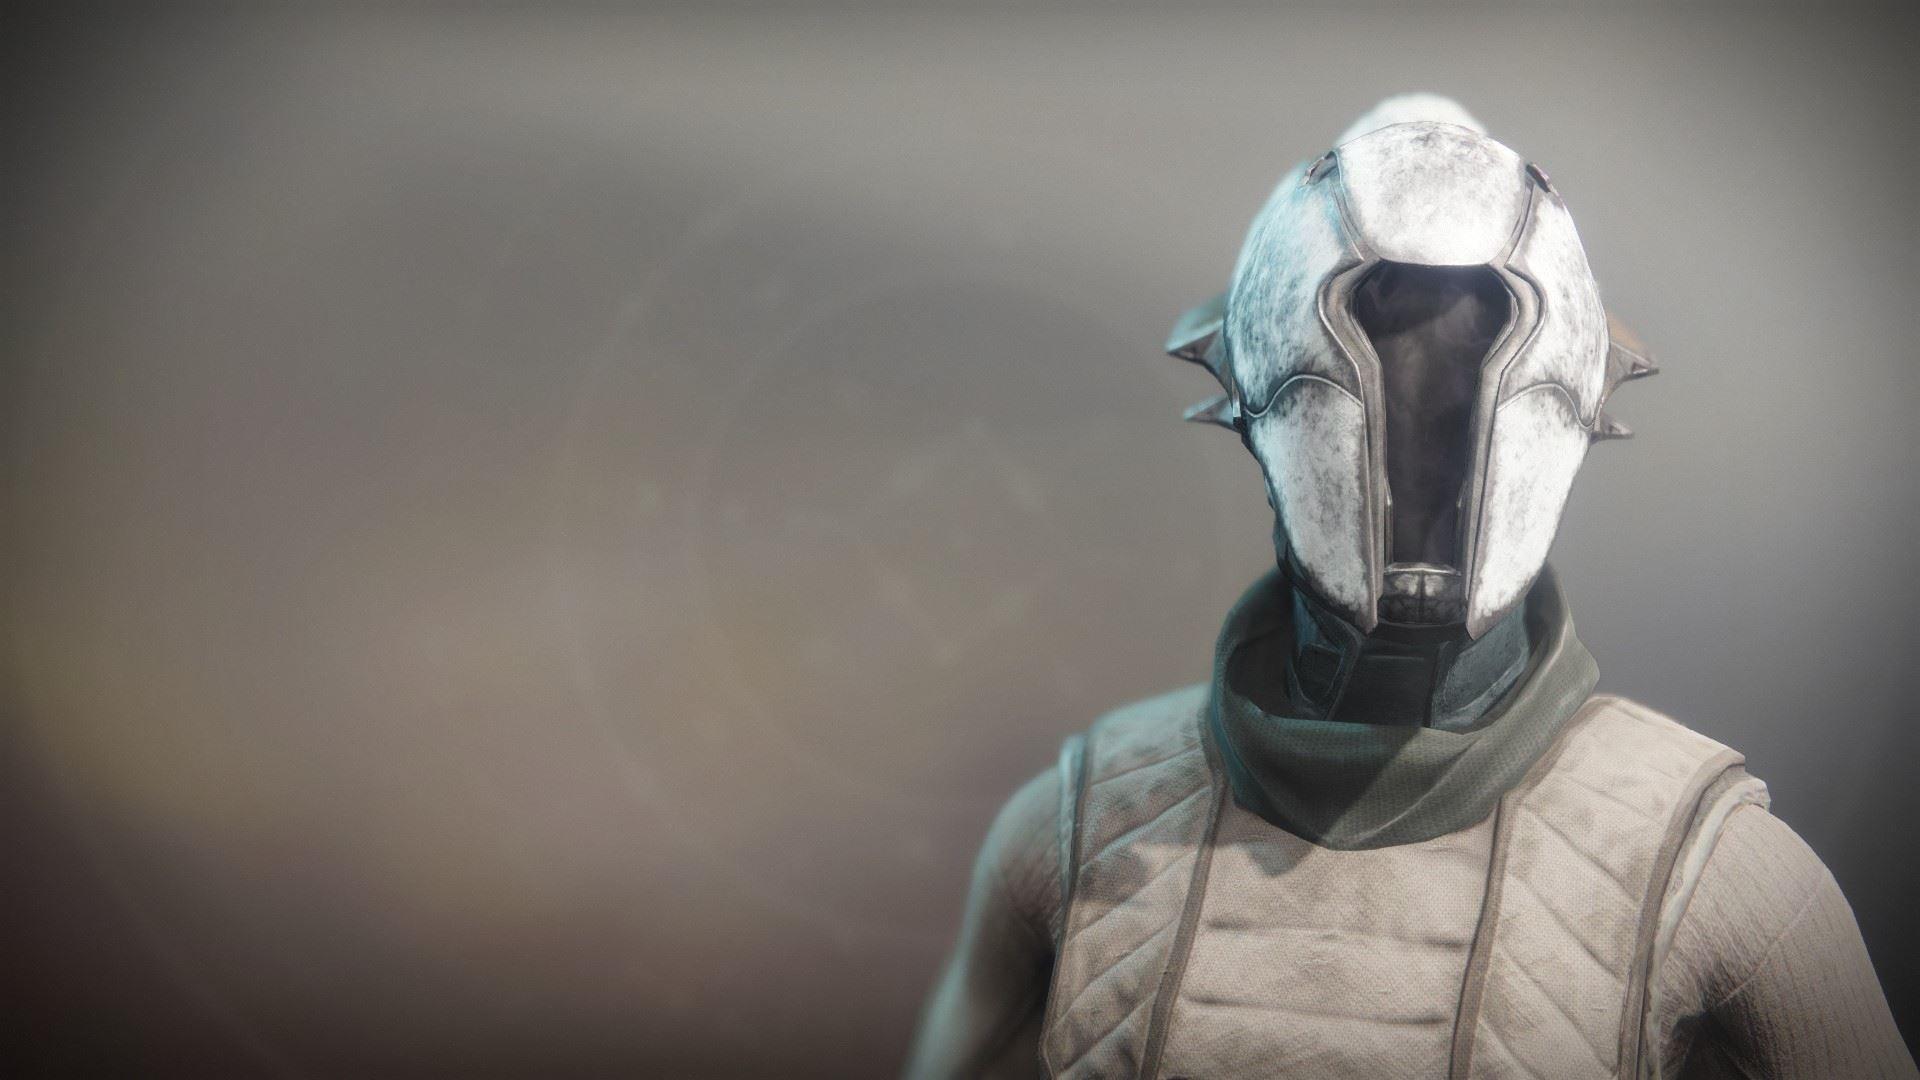 An in-game render of the Solstice Hood (Rekindled).